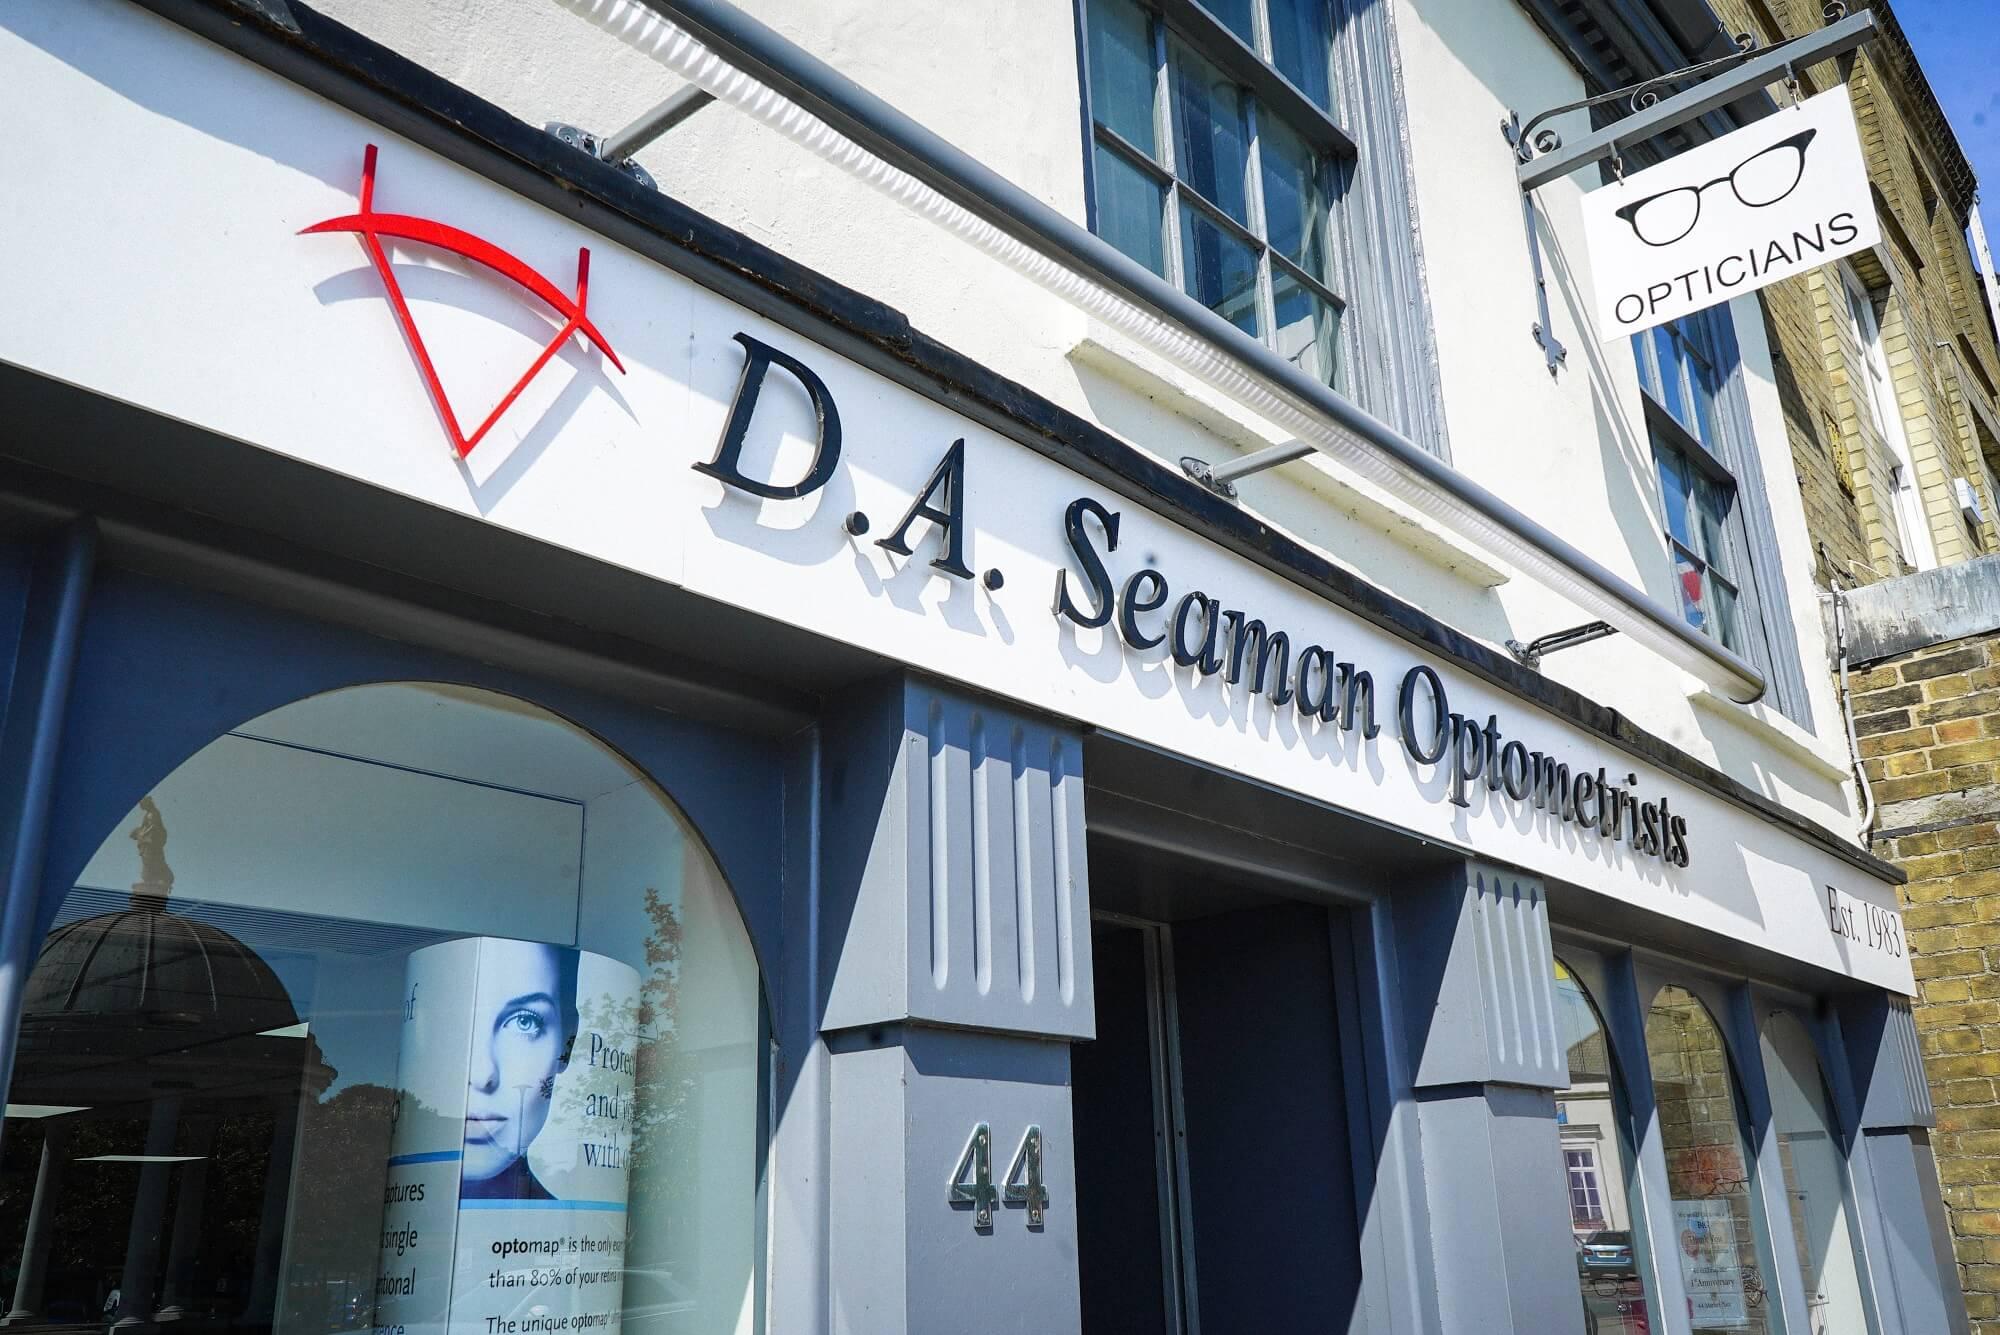 D.A. Seaman Optometrists